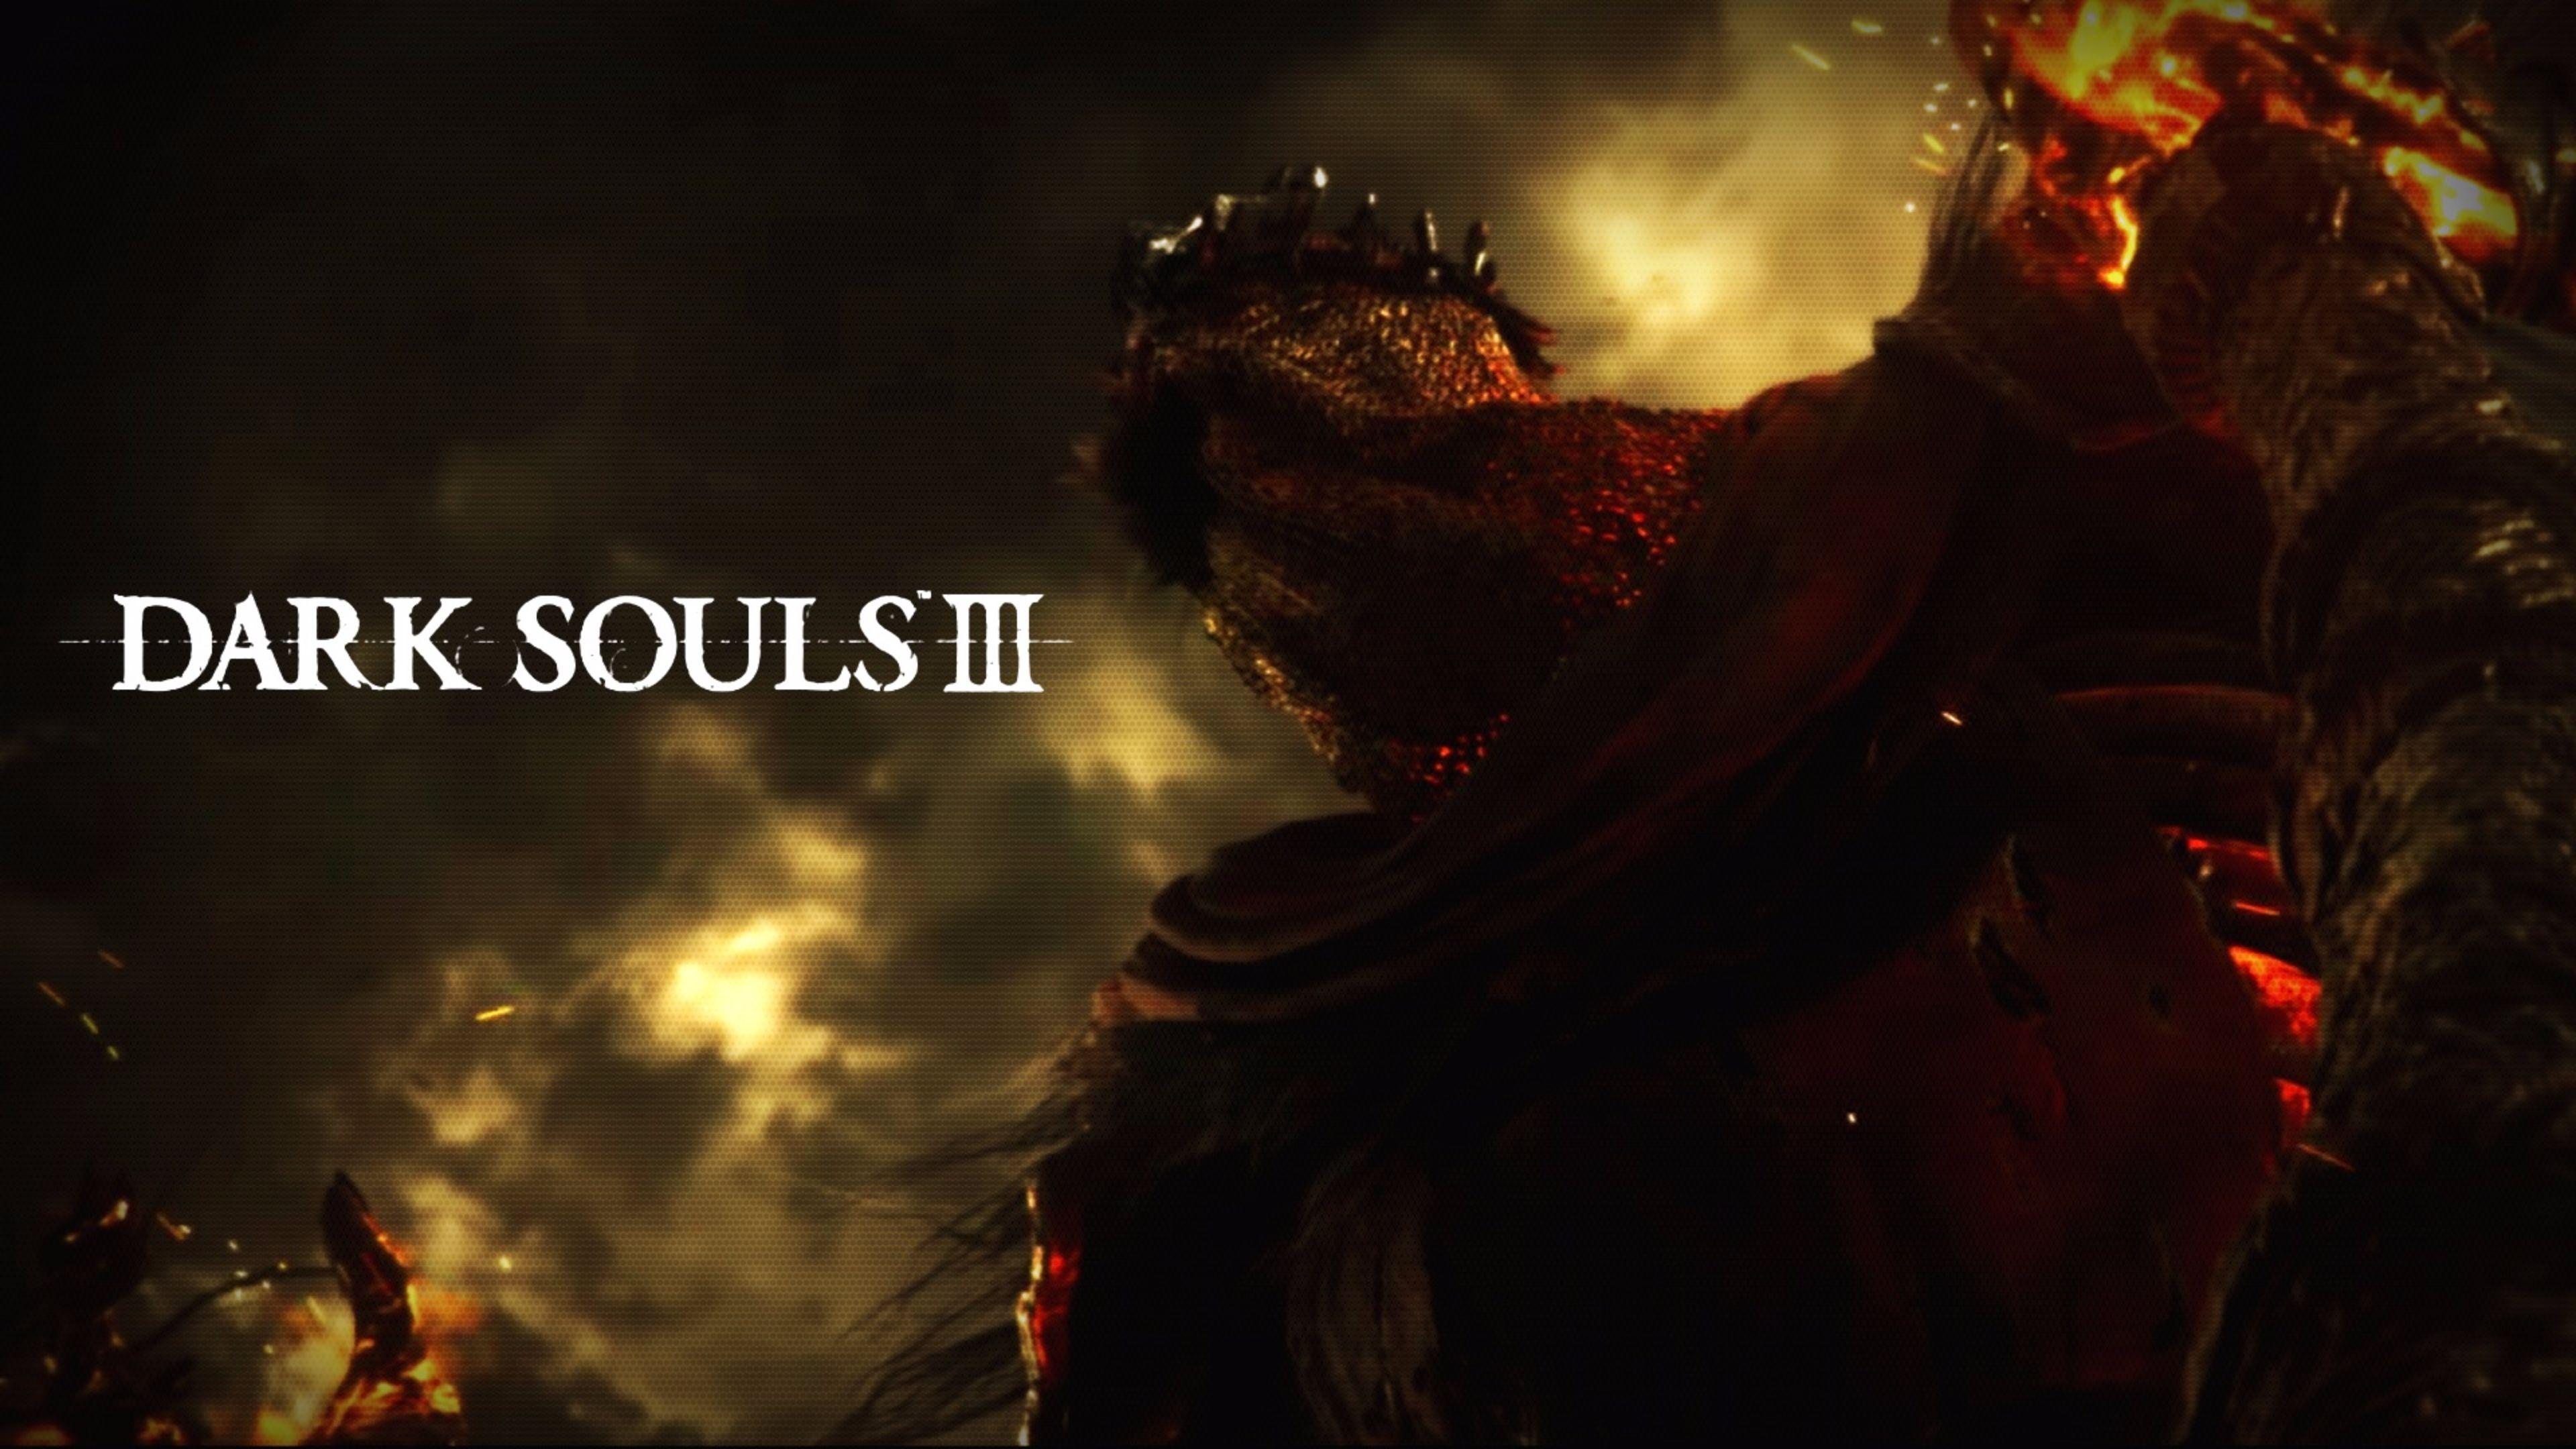 Download Dark Souls 3 4K Wallpapers 4K Wallpaper 3840x2160